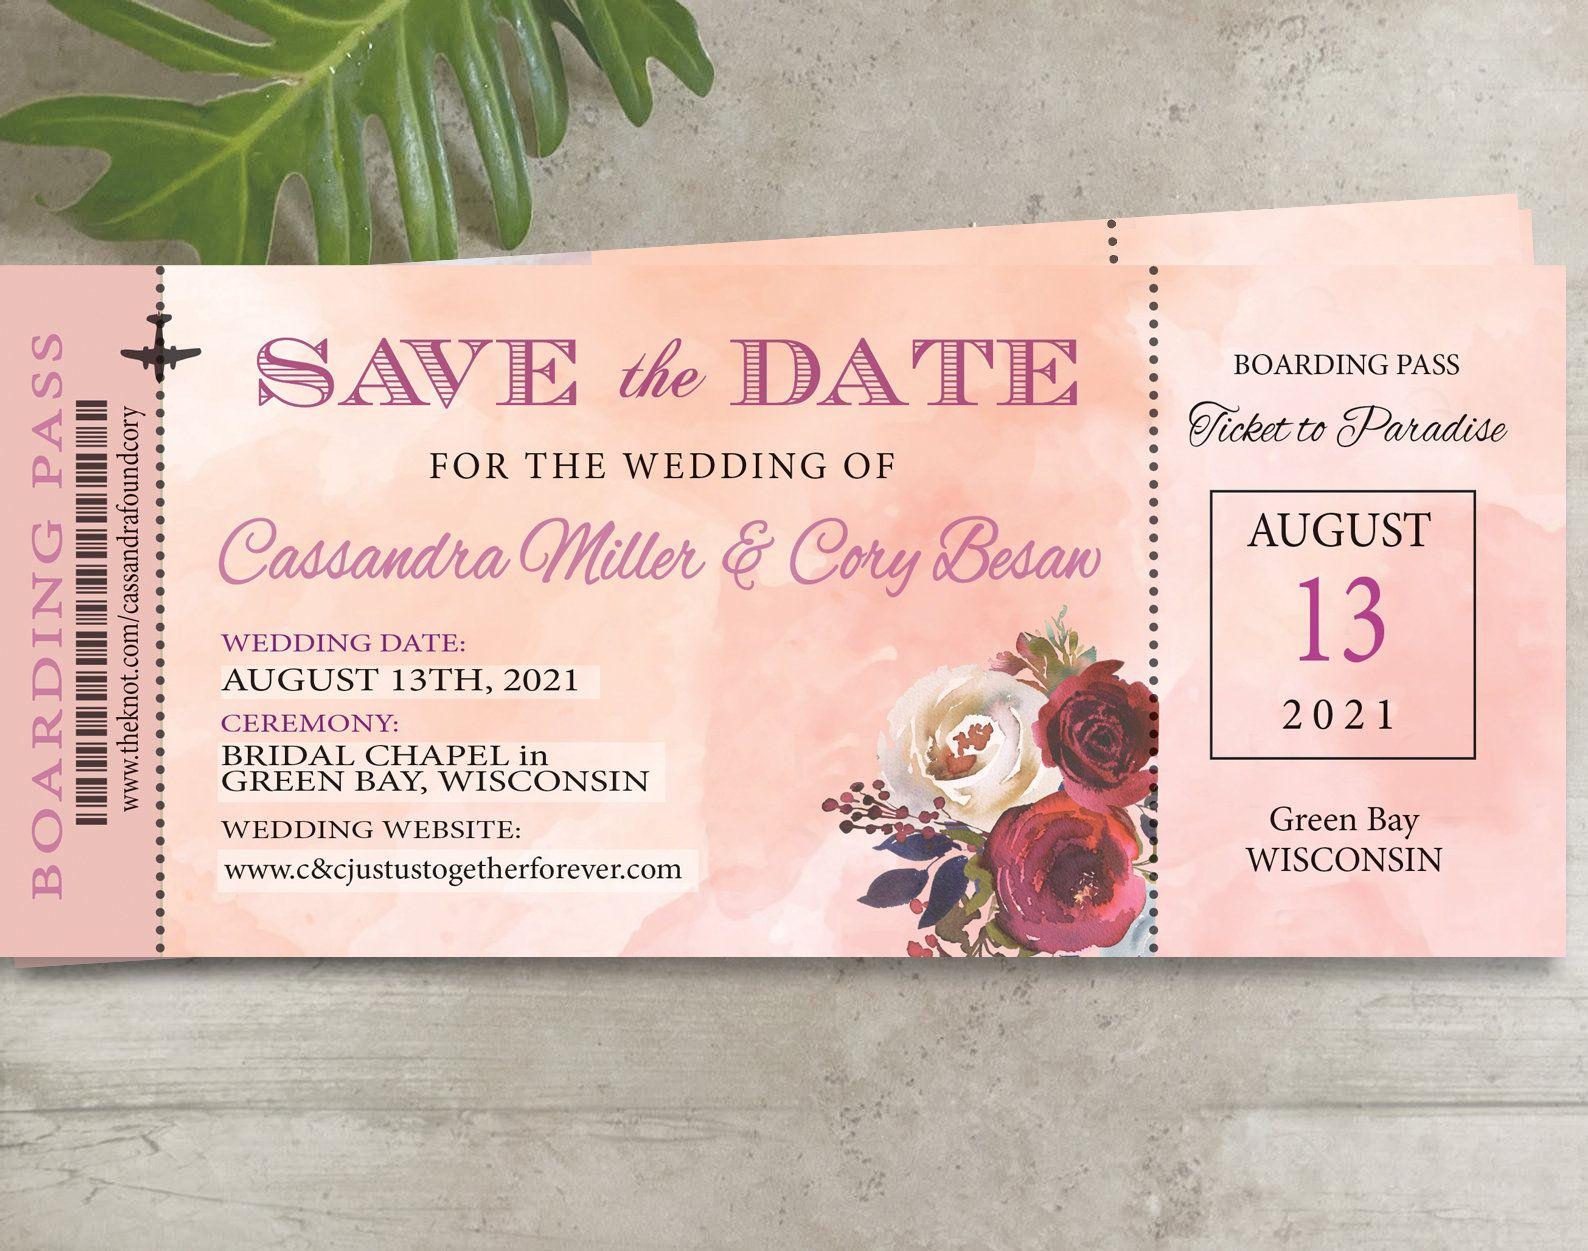 Travel Theme Boarding Pass Ticket Passport Wedding Save the Date Wedding Reception Elope Invite Destination Travel passport boarding pass